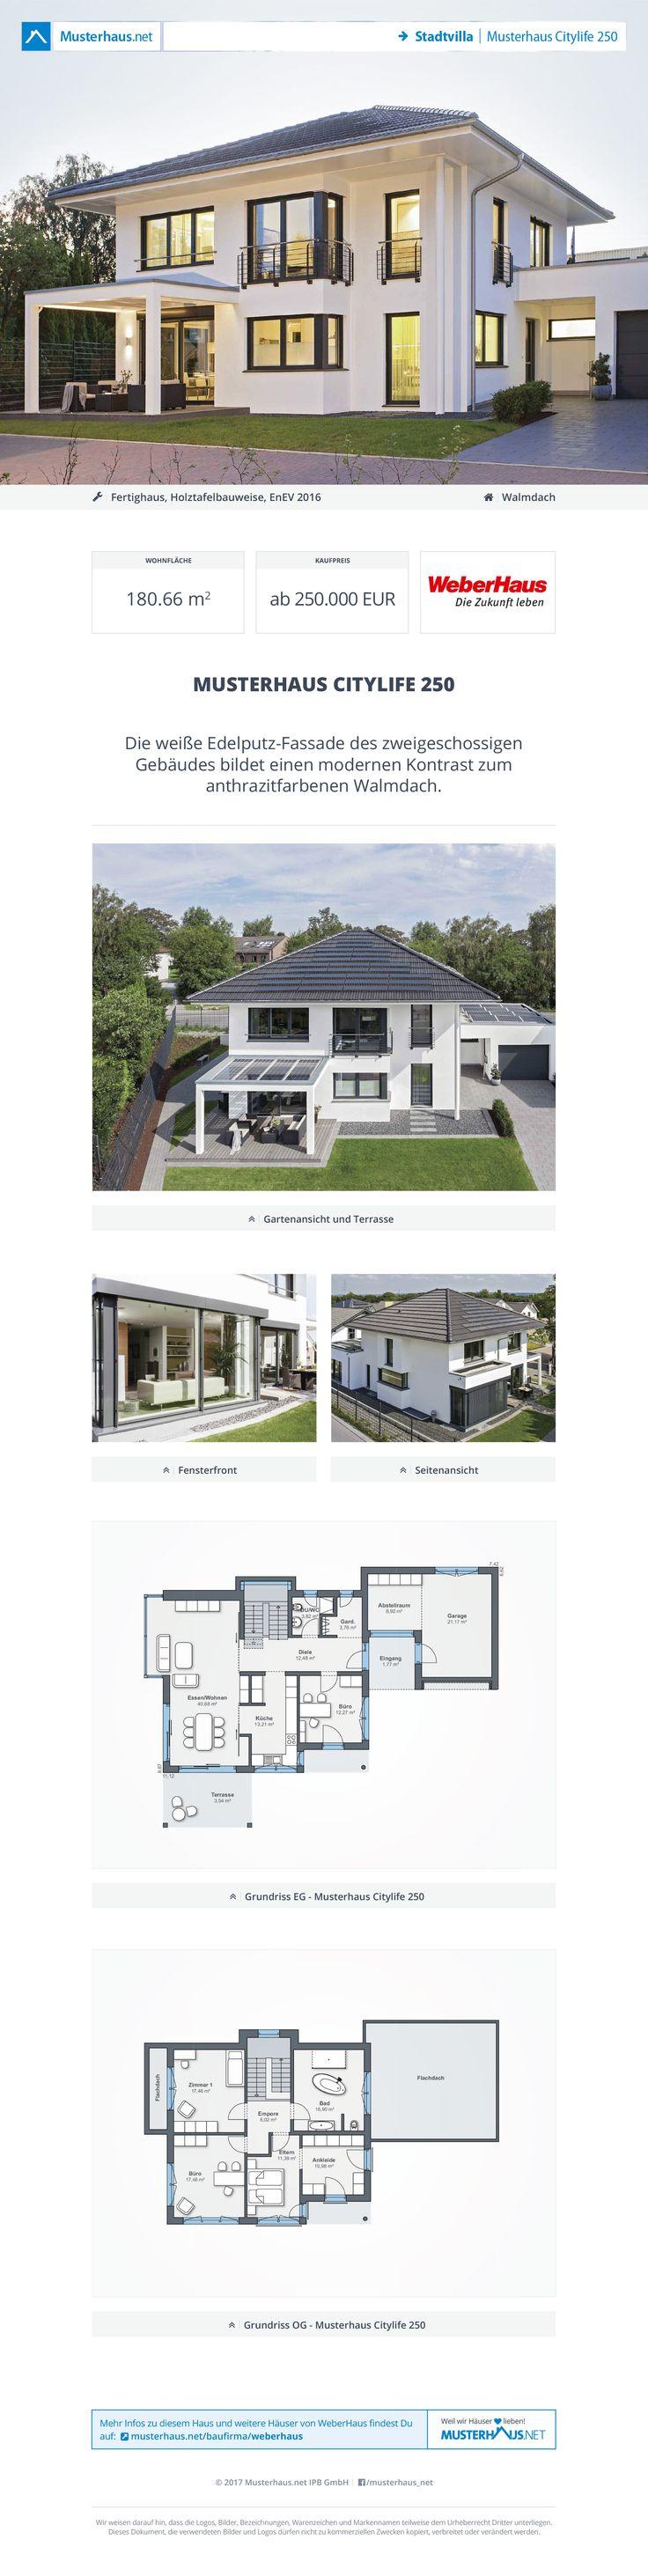 Stadtvilla CityLife 250 · Weber Haus · Jetzt bei Musterhaus Unterlagen